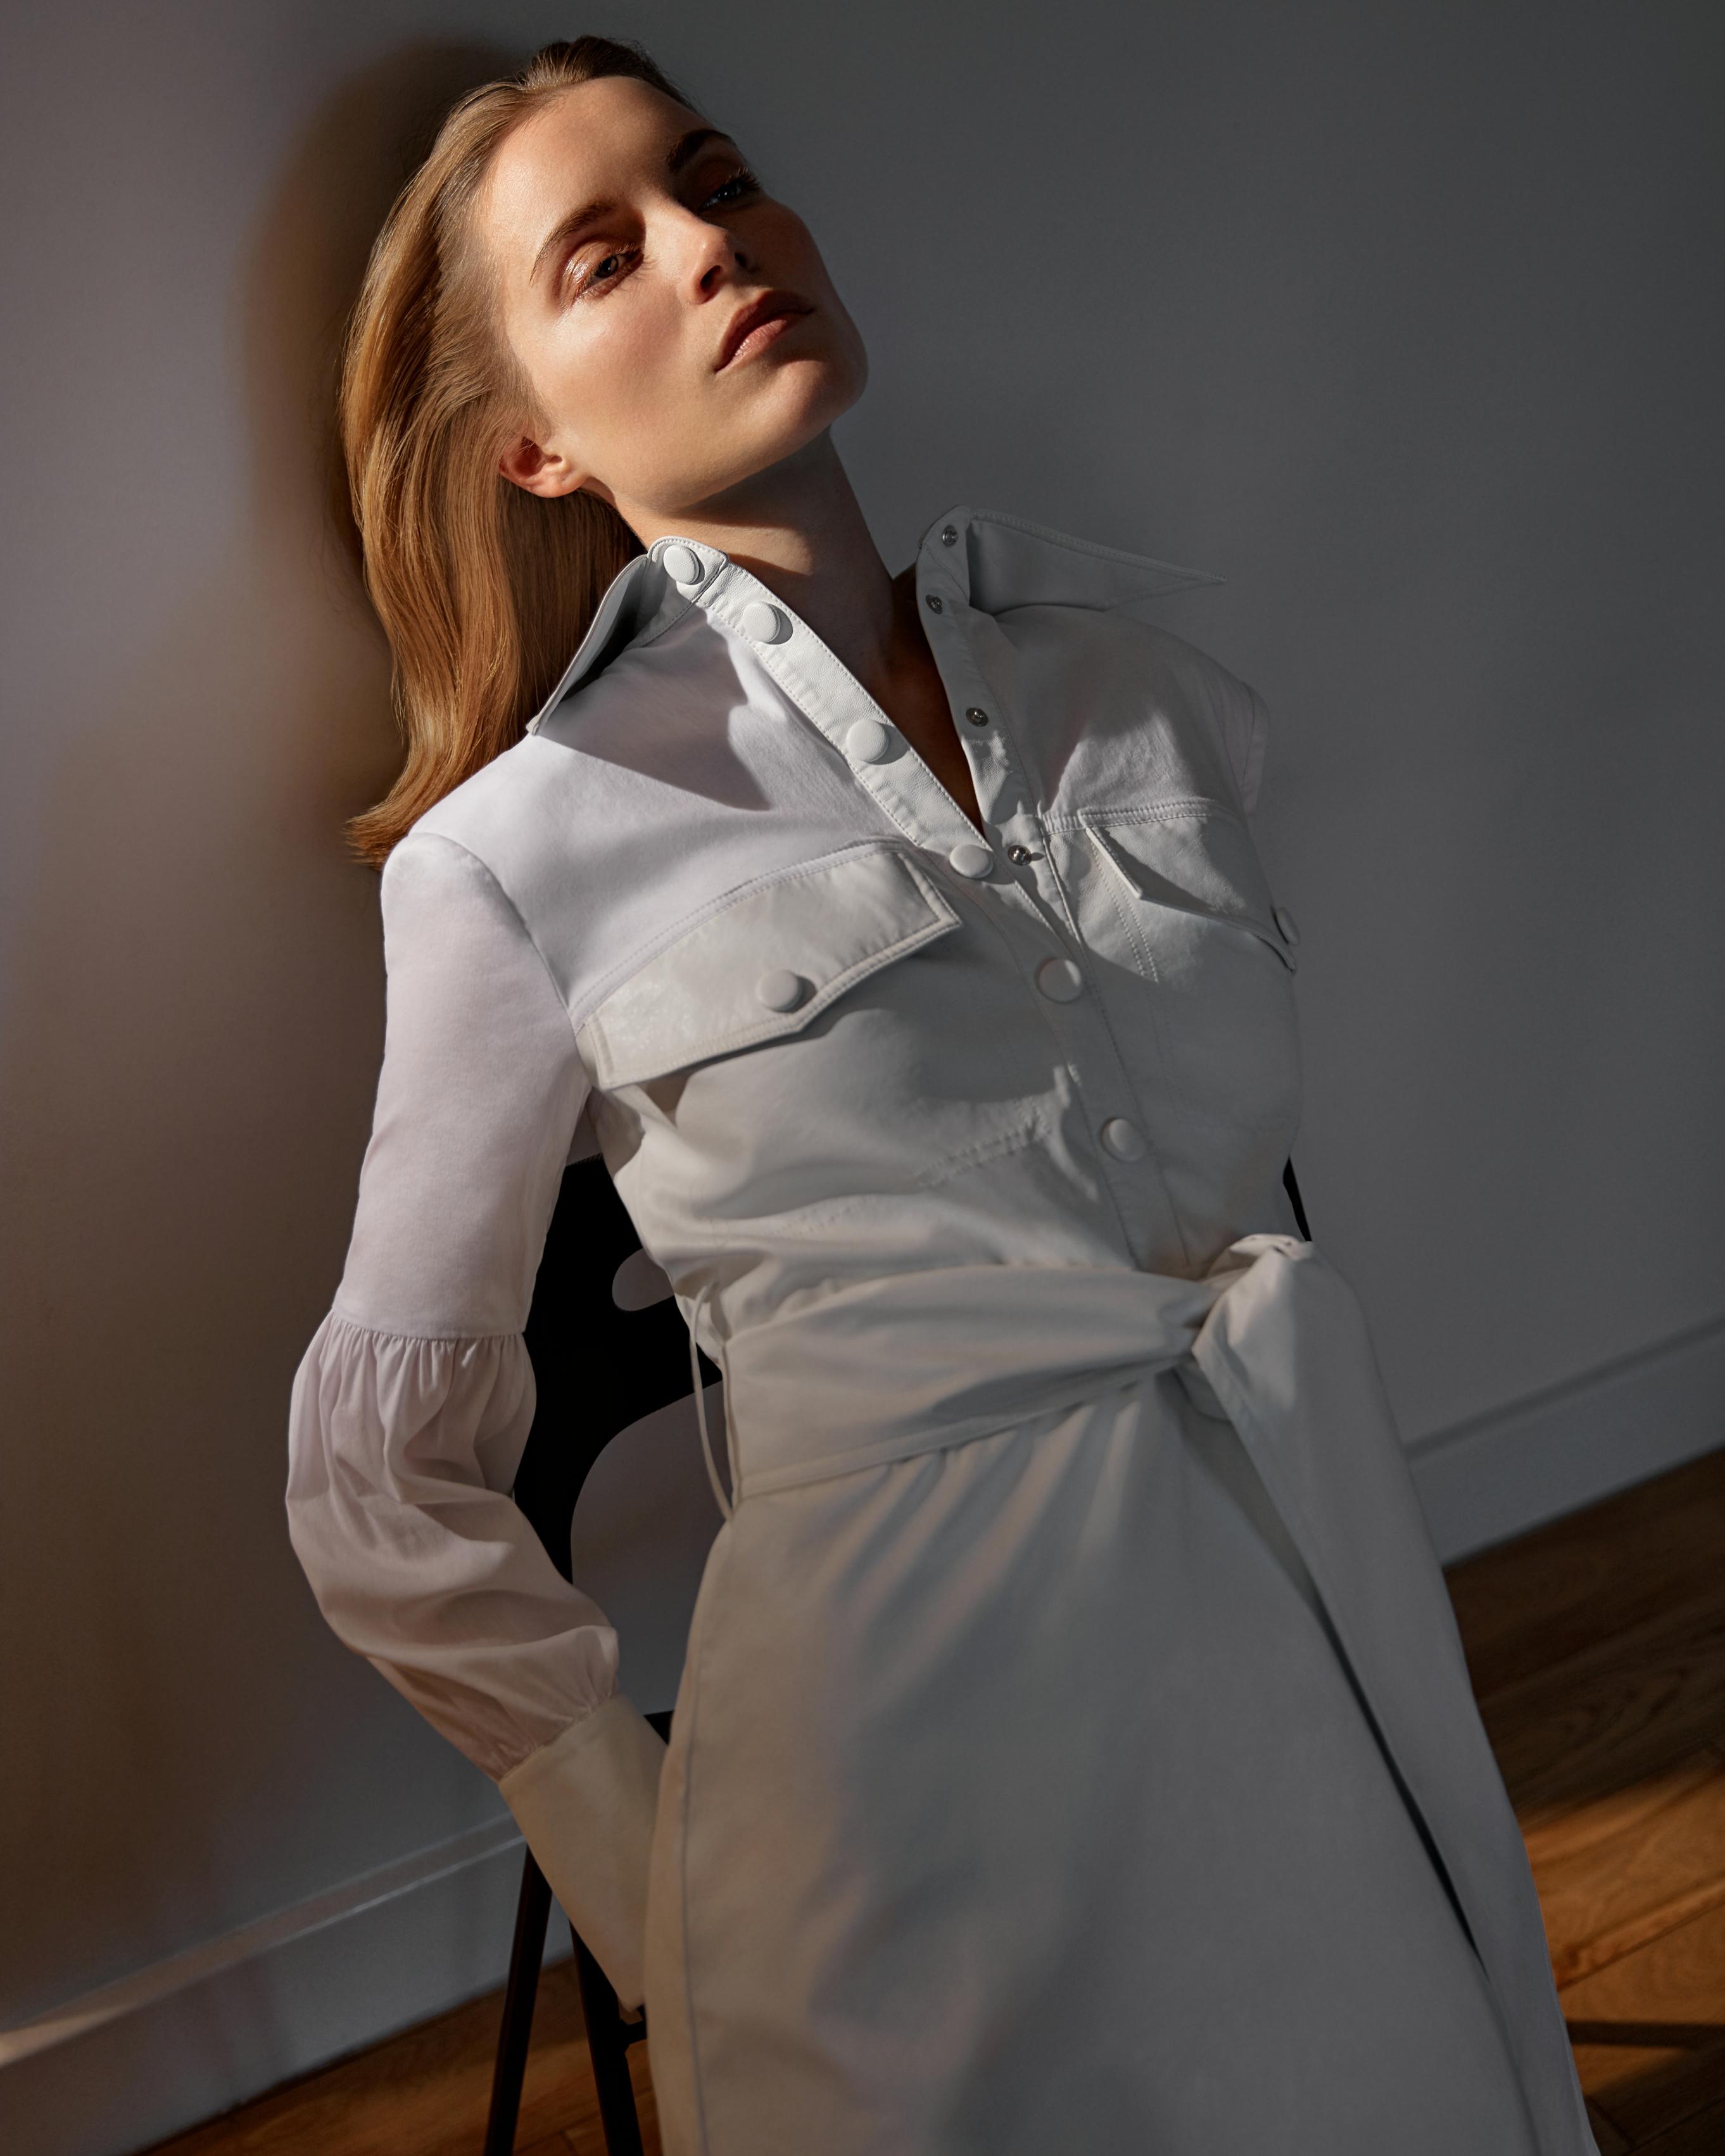 iakovos-Adrianna Gradziel_Models1 (1)